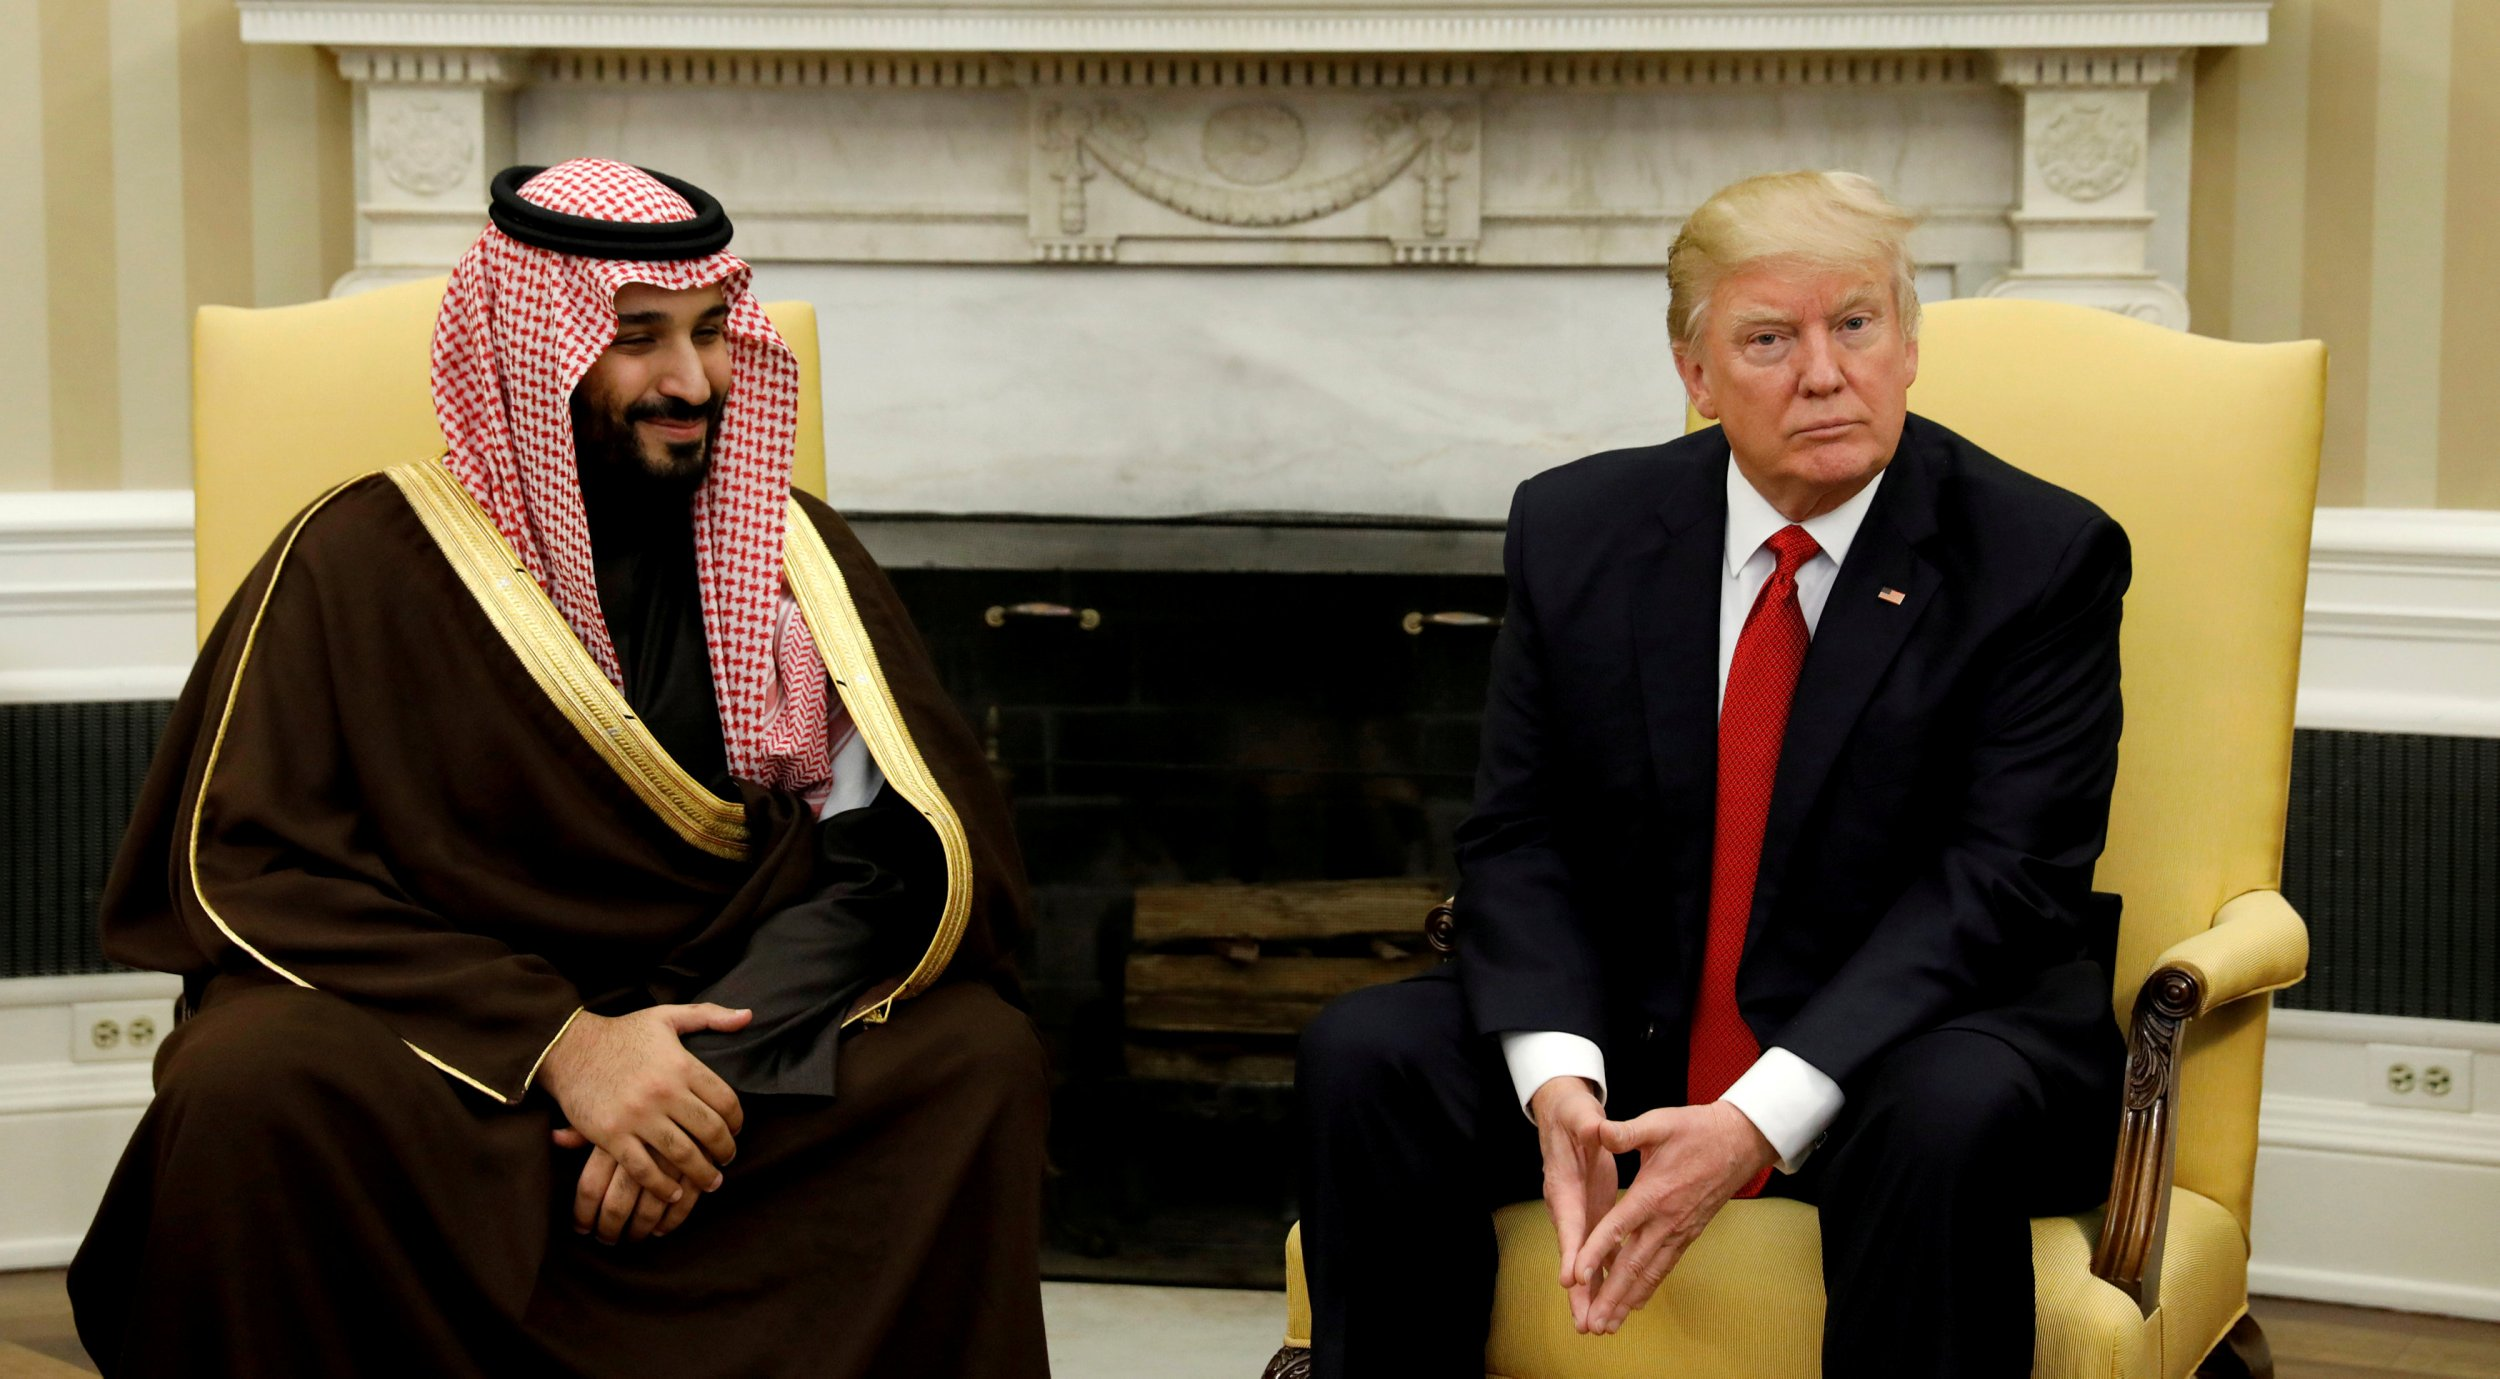 U.S. Finalizing $100 Billion Saudi Arms Deal: White House Official